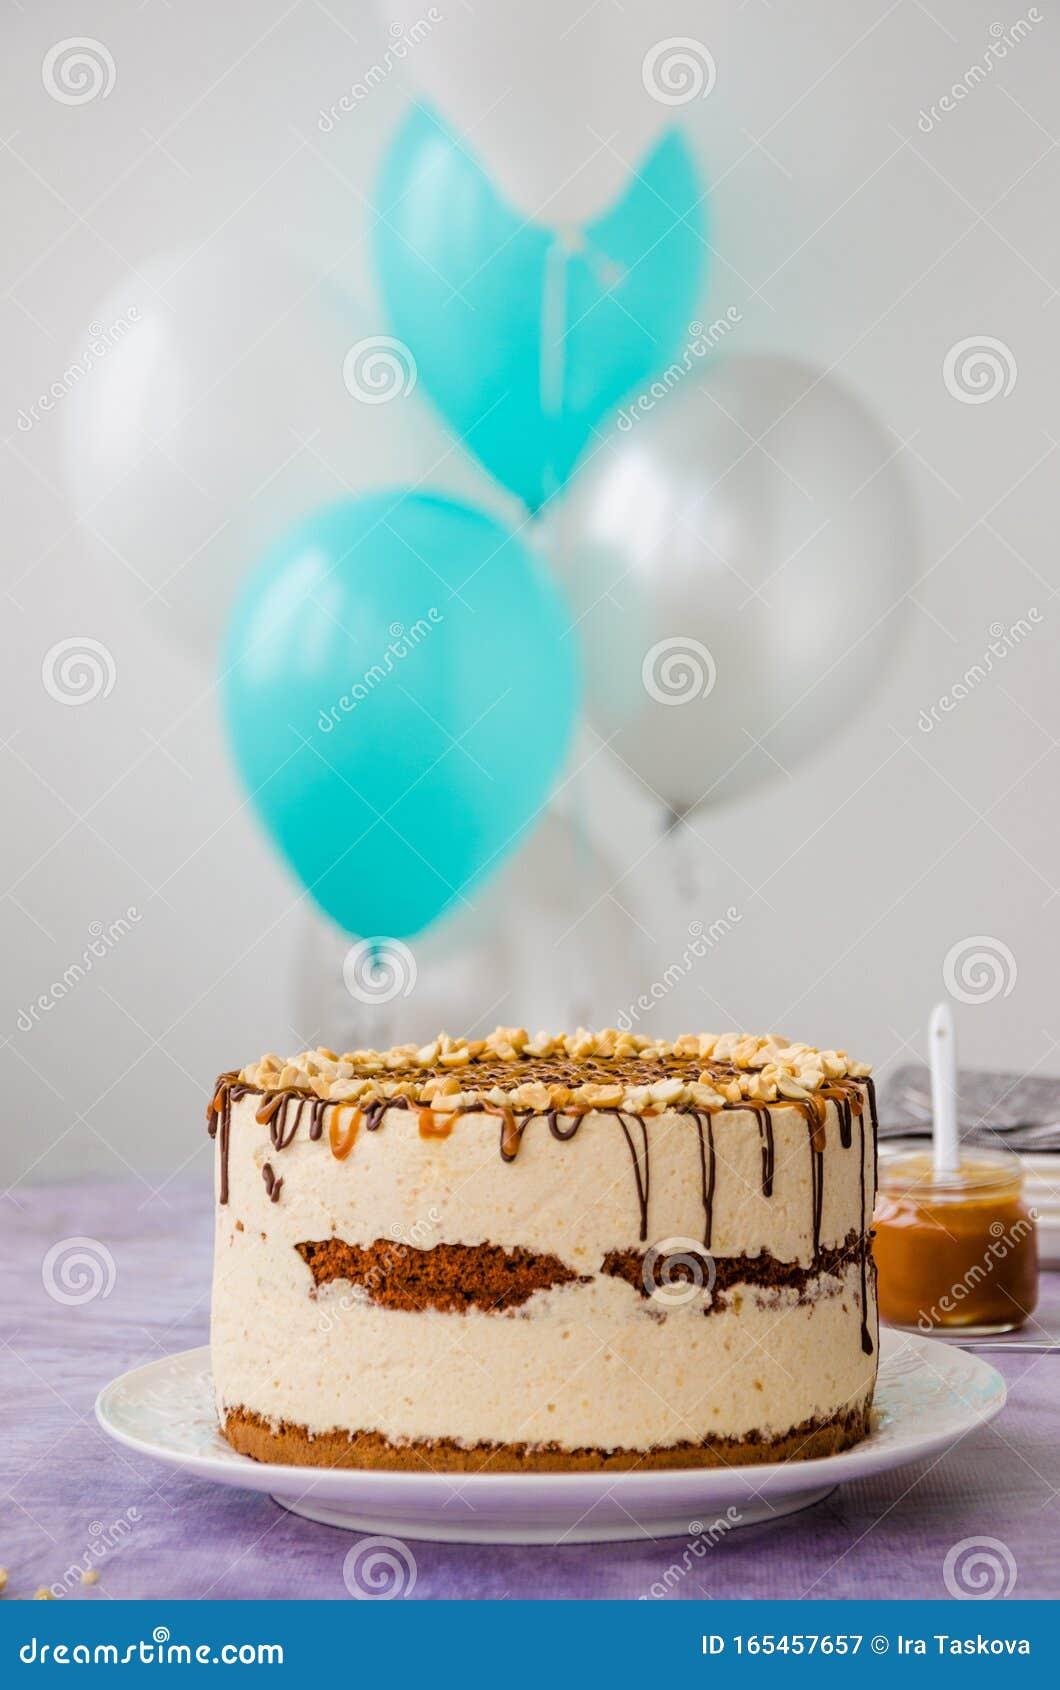 Astounding Birthday Cake Snickers Homemade Holiday Cake With Caramel Nougat Funny Birthday Cards Online Hetedamsfinfo